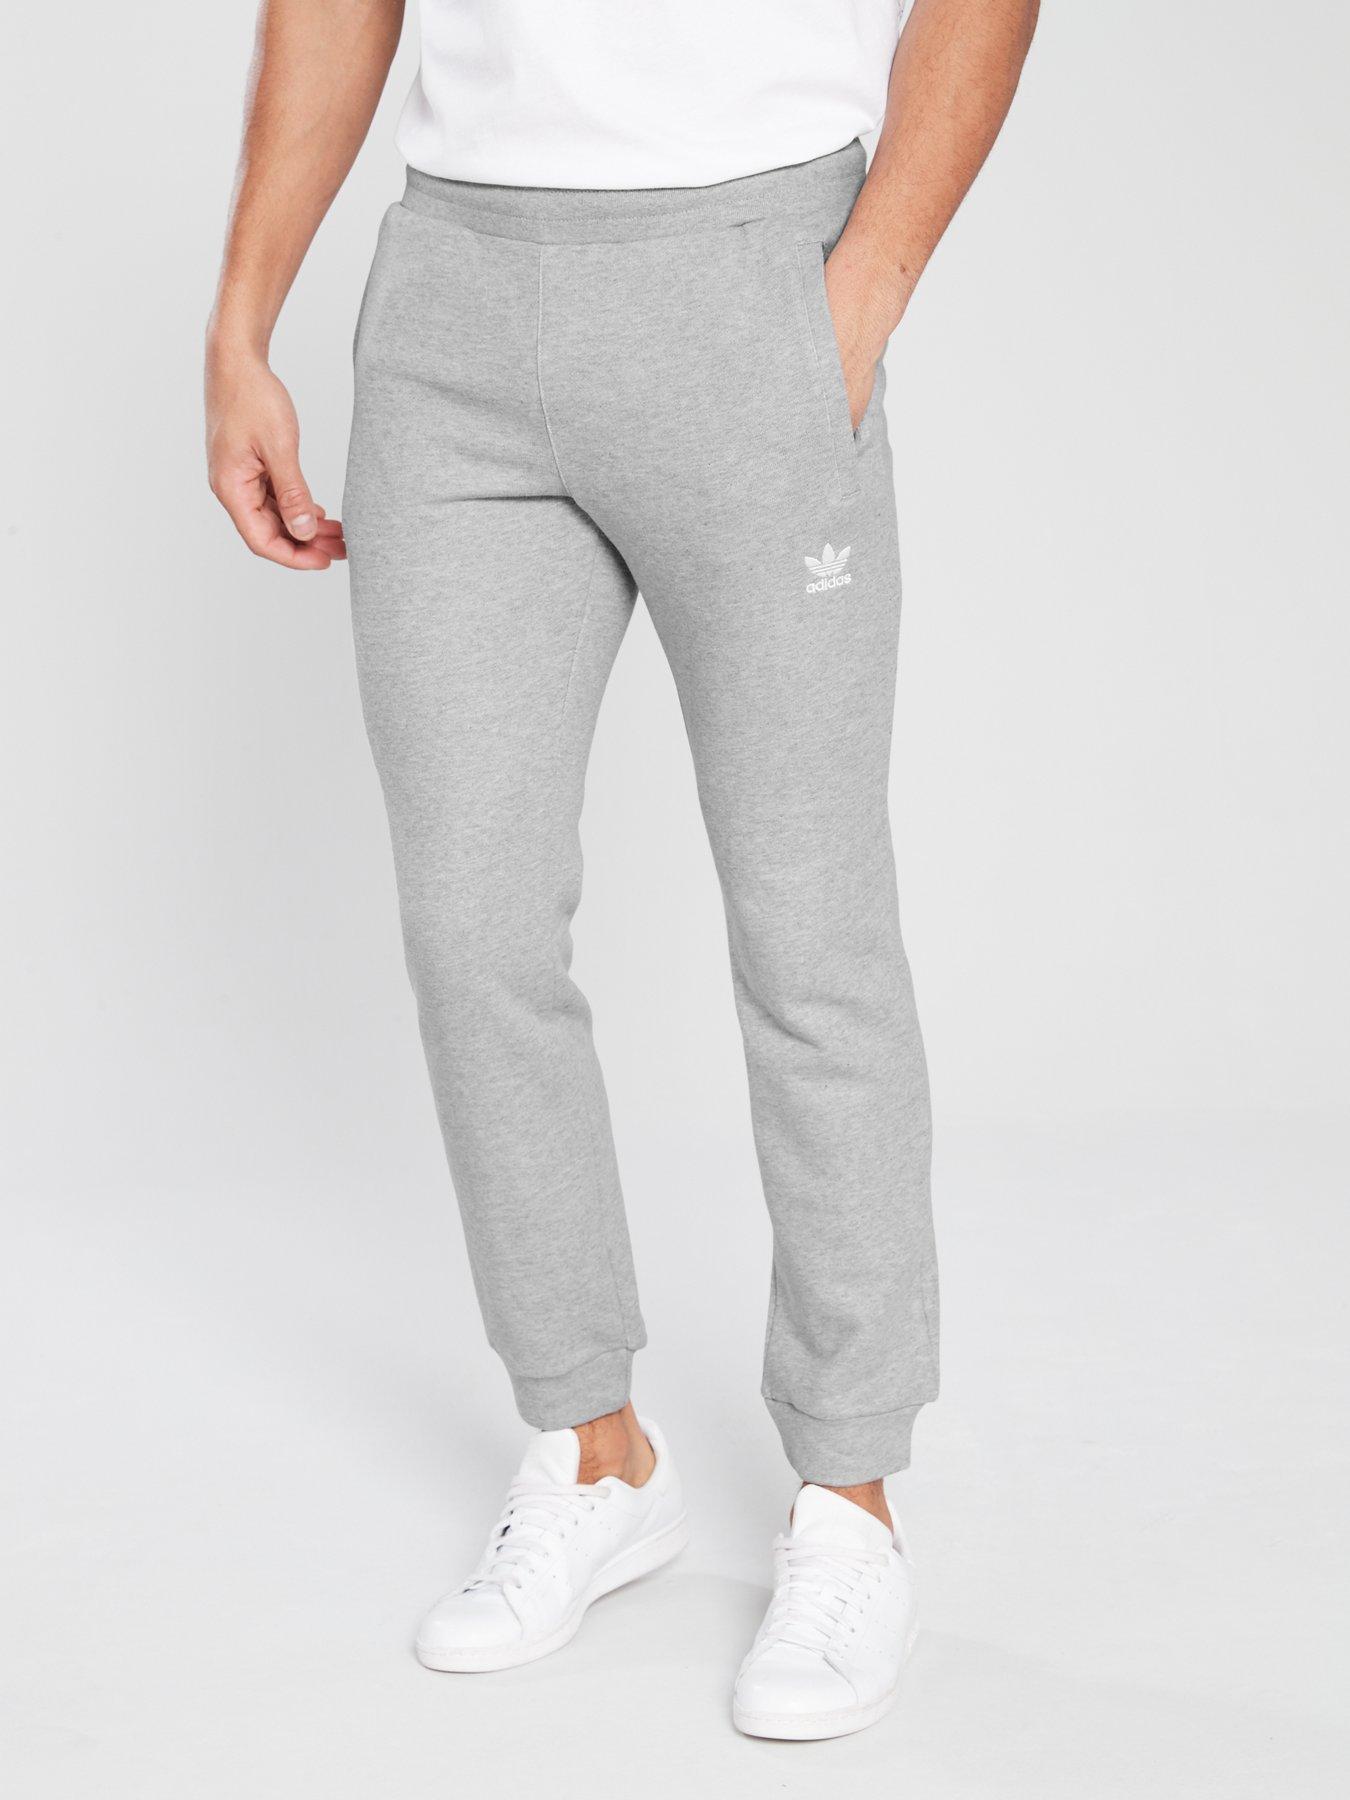 Men's Tracksuit Bottoms & Jogging Trousers   Littlewoods Ireland